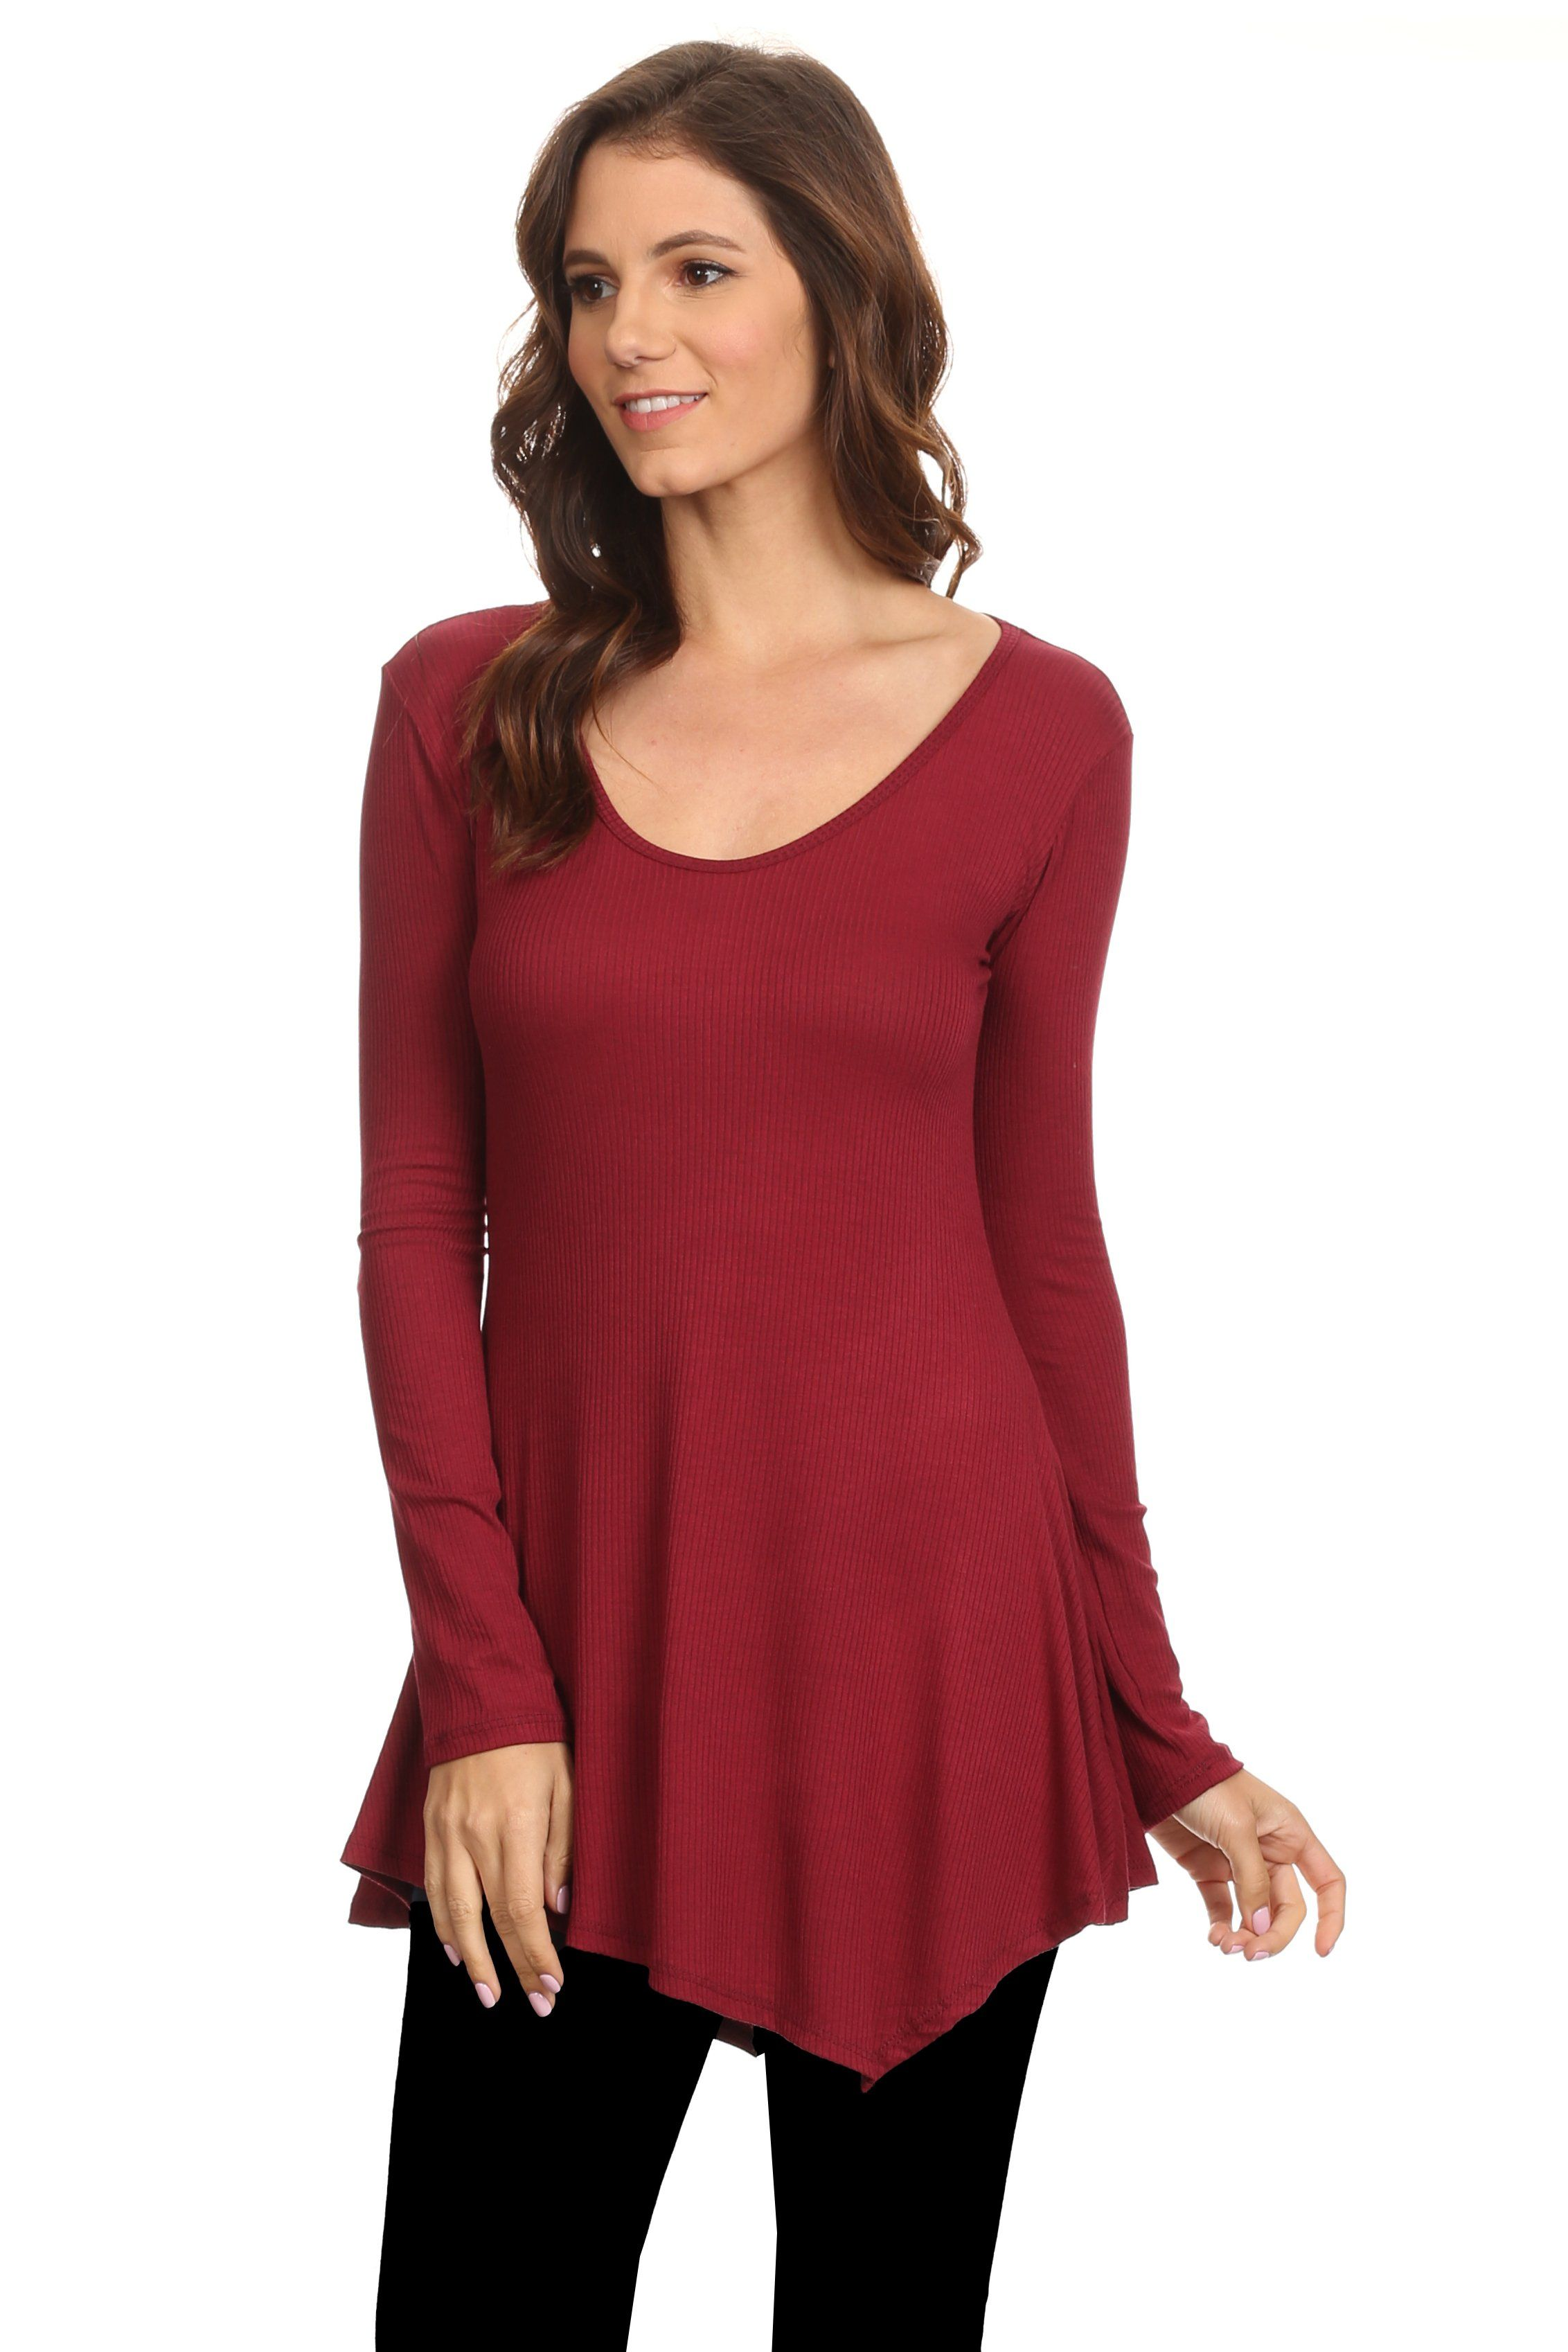 b654d6d3f6c Women's Long Sleeve Ribbed Shirt Handkerchief Hem Tunic Made in USA ...